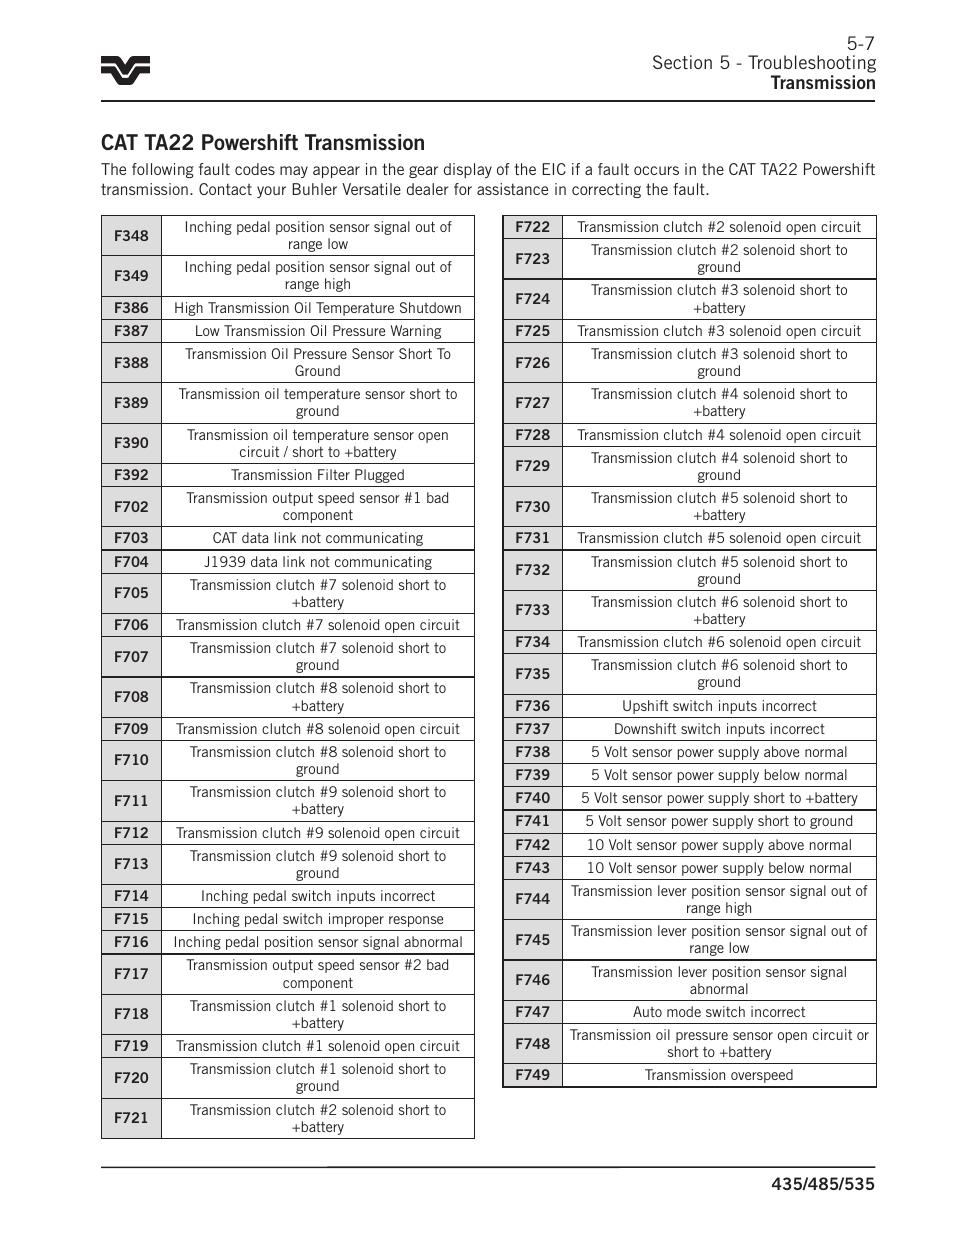 Cat ta22 powershift transmission   Buhler 535 User Manual